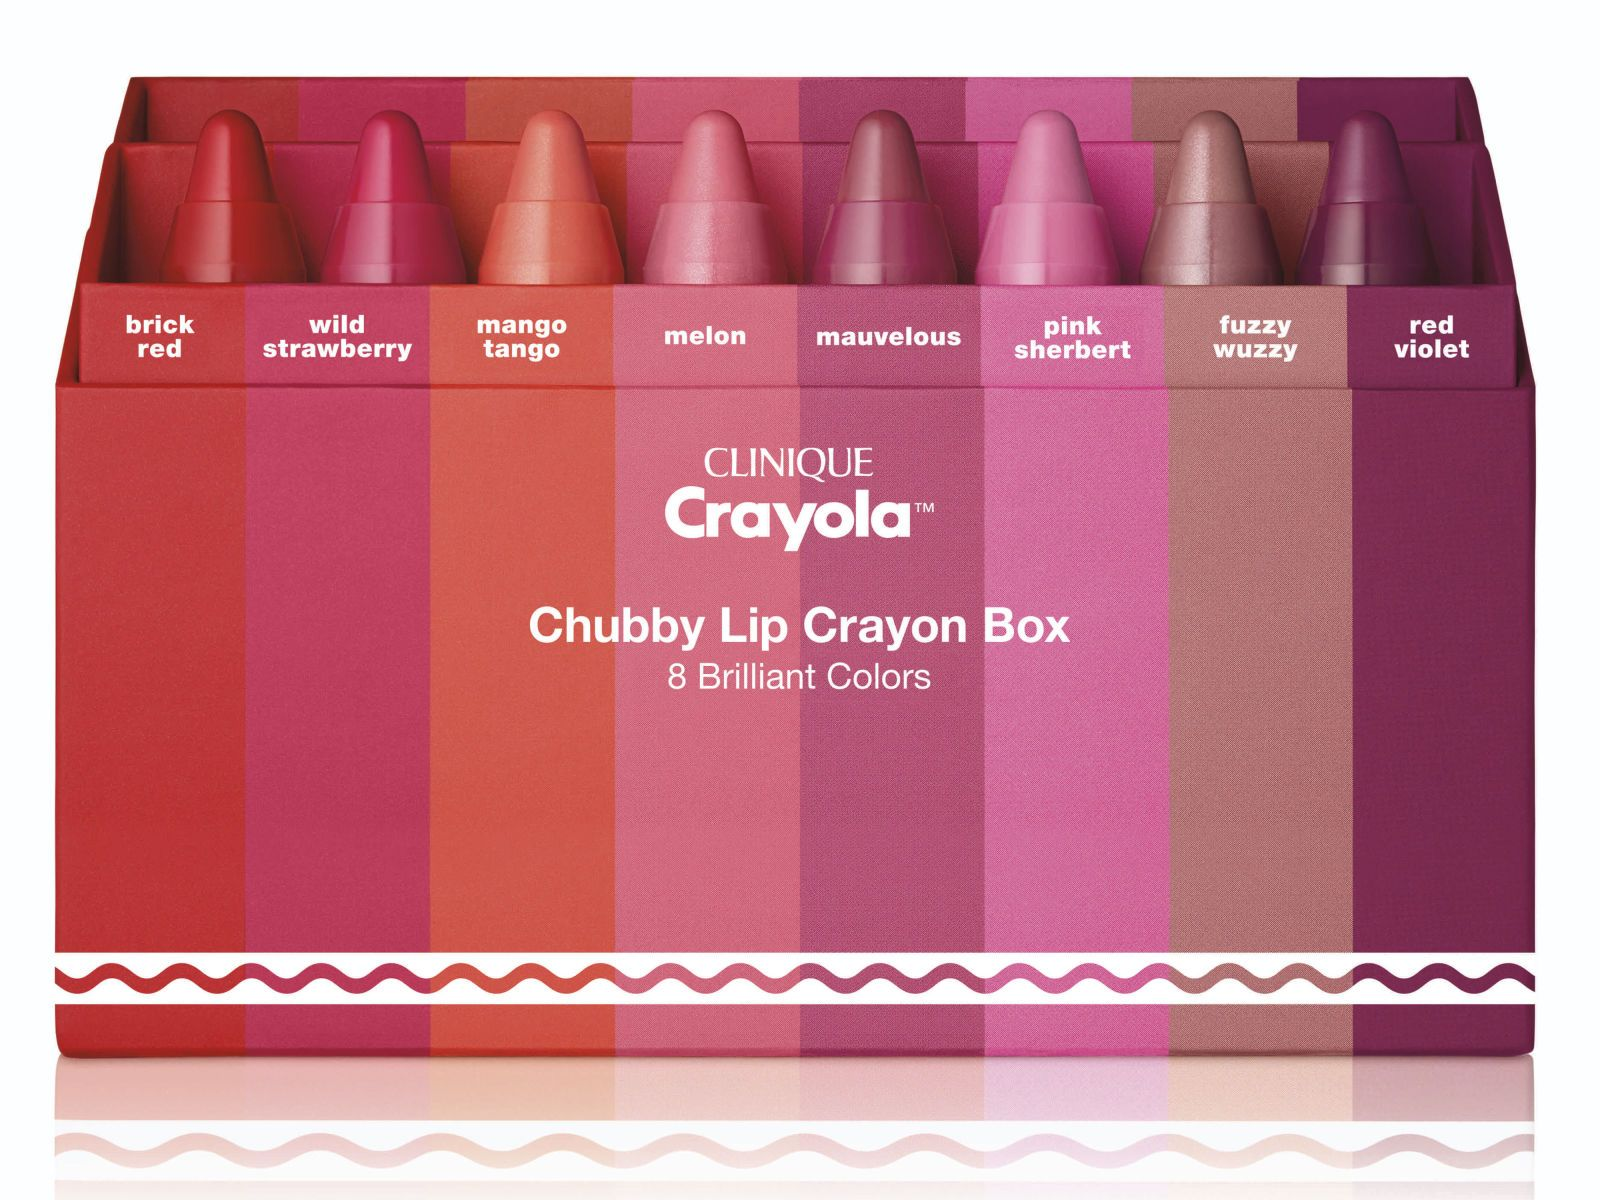 Clinique has teamed up with Crayola Clinique crayola